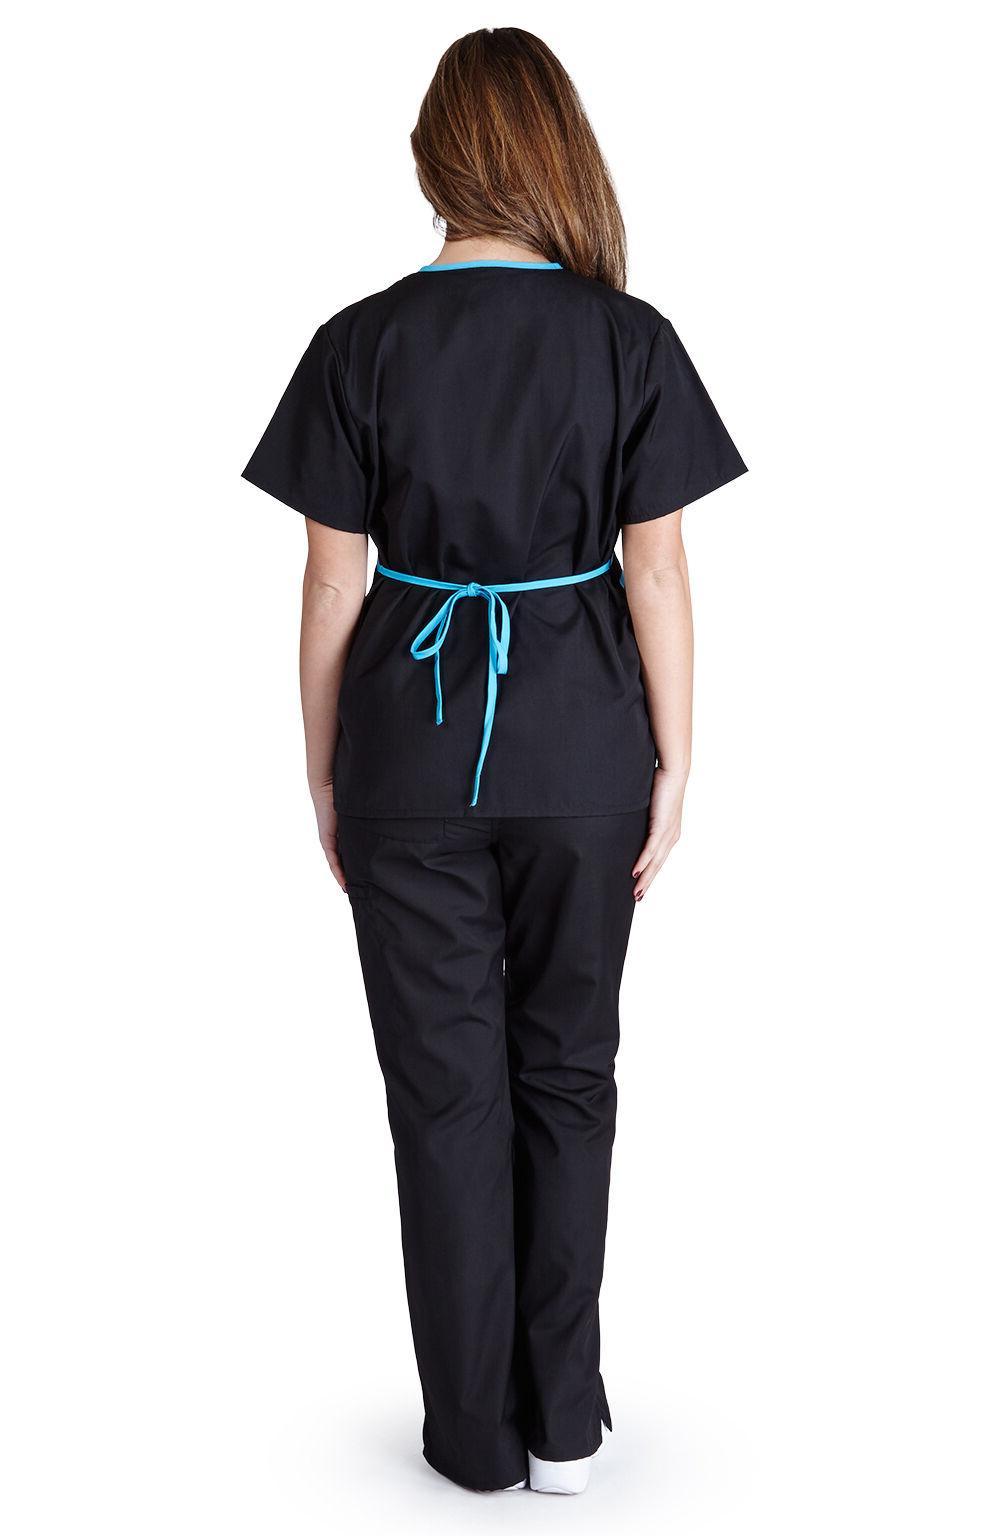 Medical Scrubs UNIFORMS Contrast Mock Size XS S M L XL